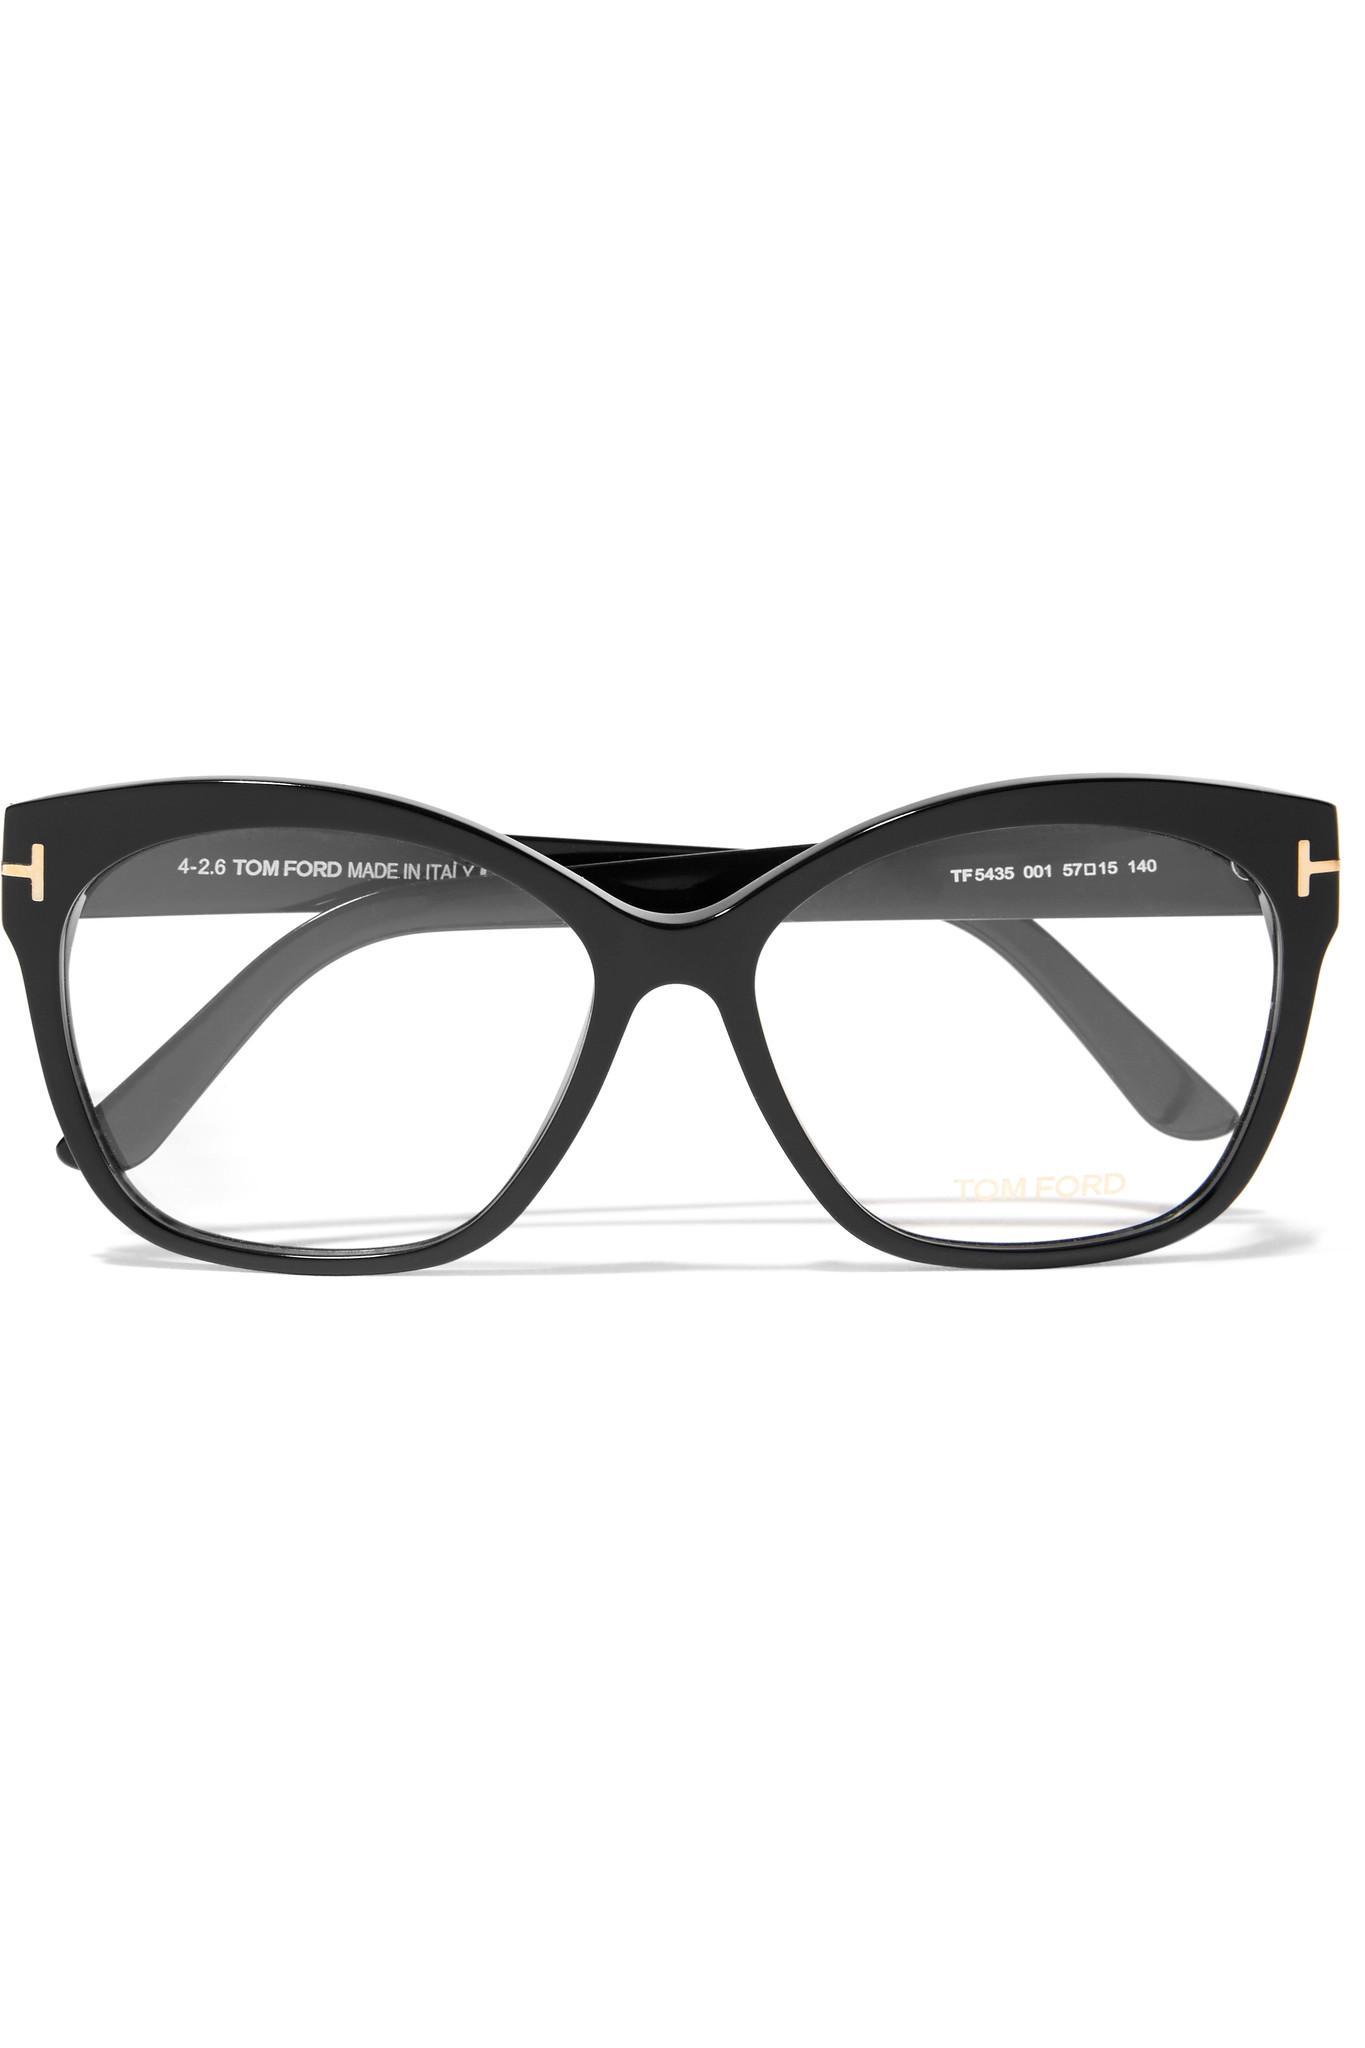 3226c4b9061 Tom Ford Square-frame Acetate Optical Glasses in Black - Lyst